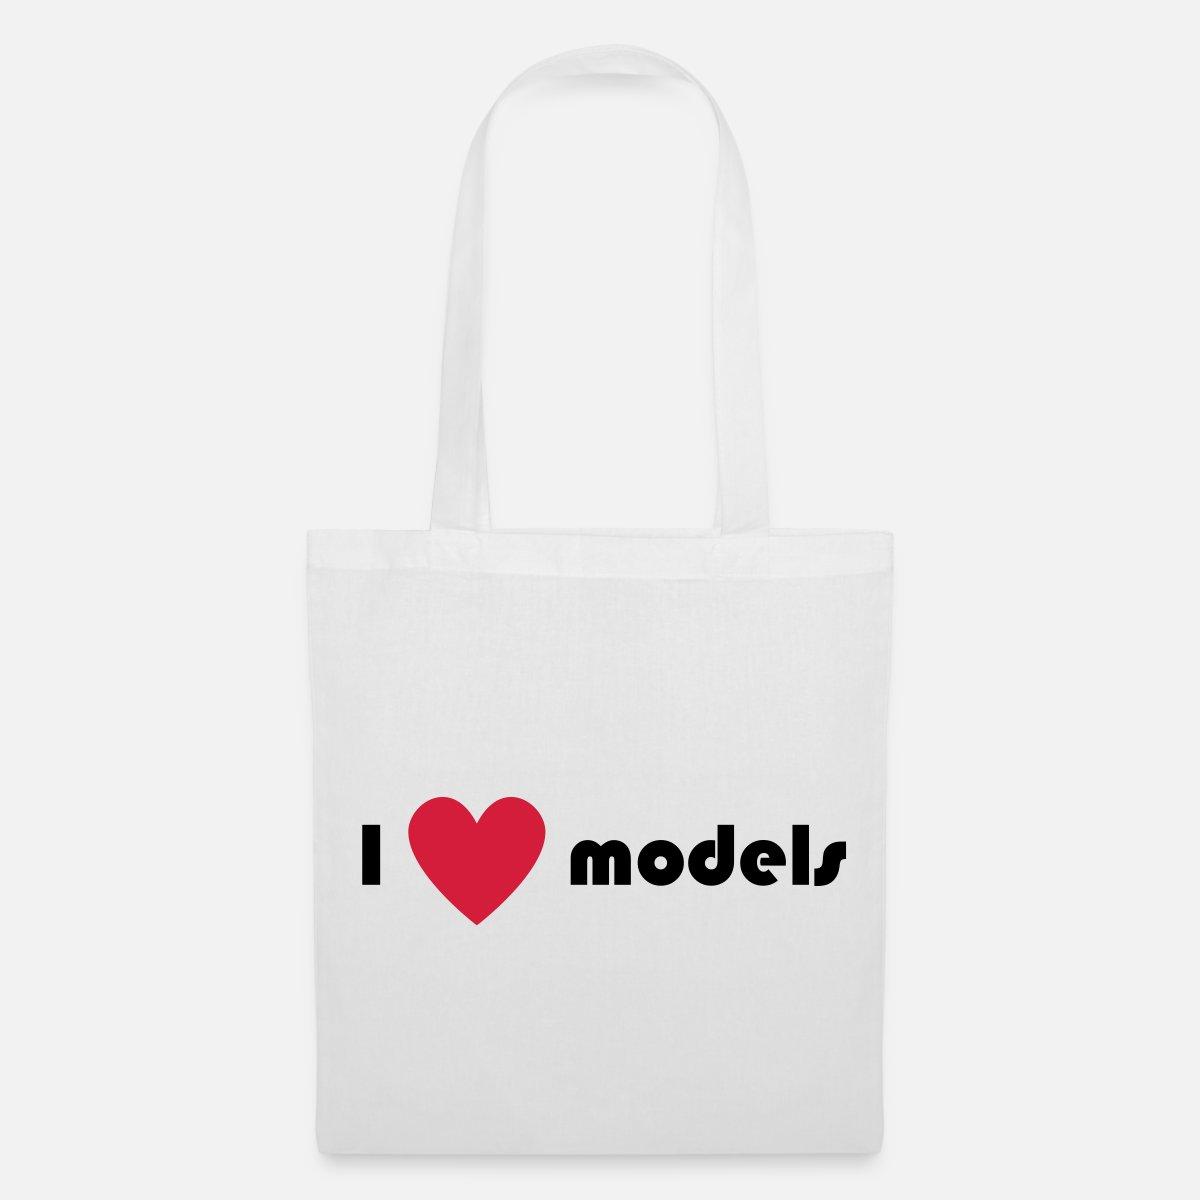 832da80fe7f I love models Tote Bag   Spreadshirt